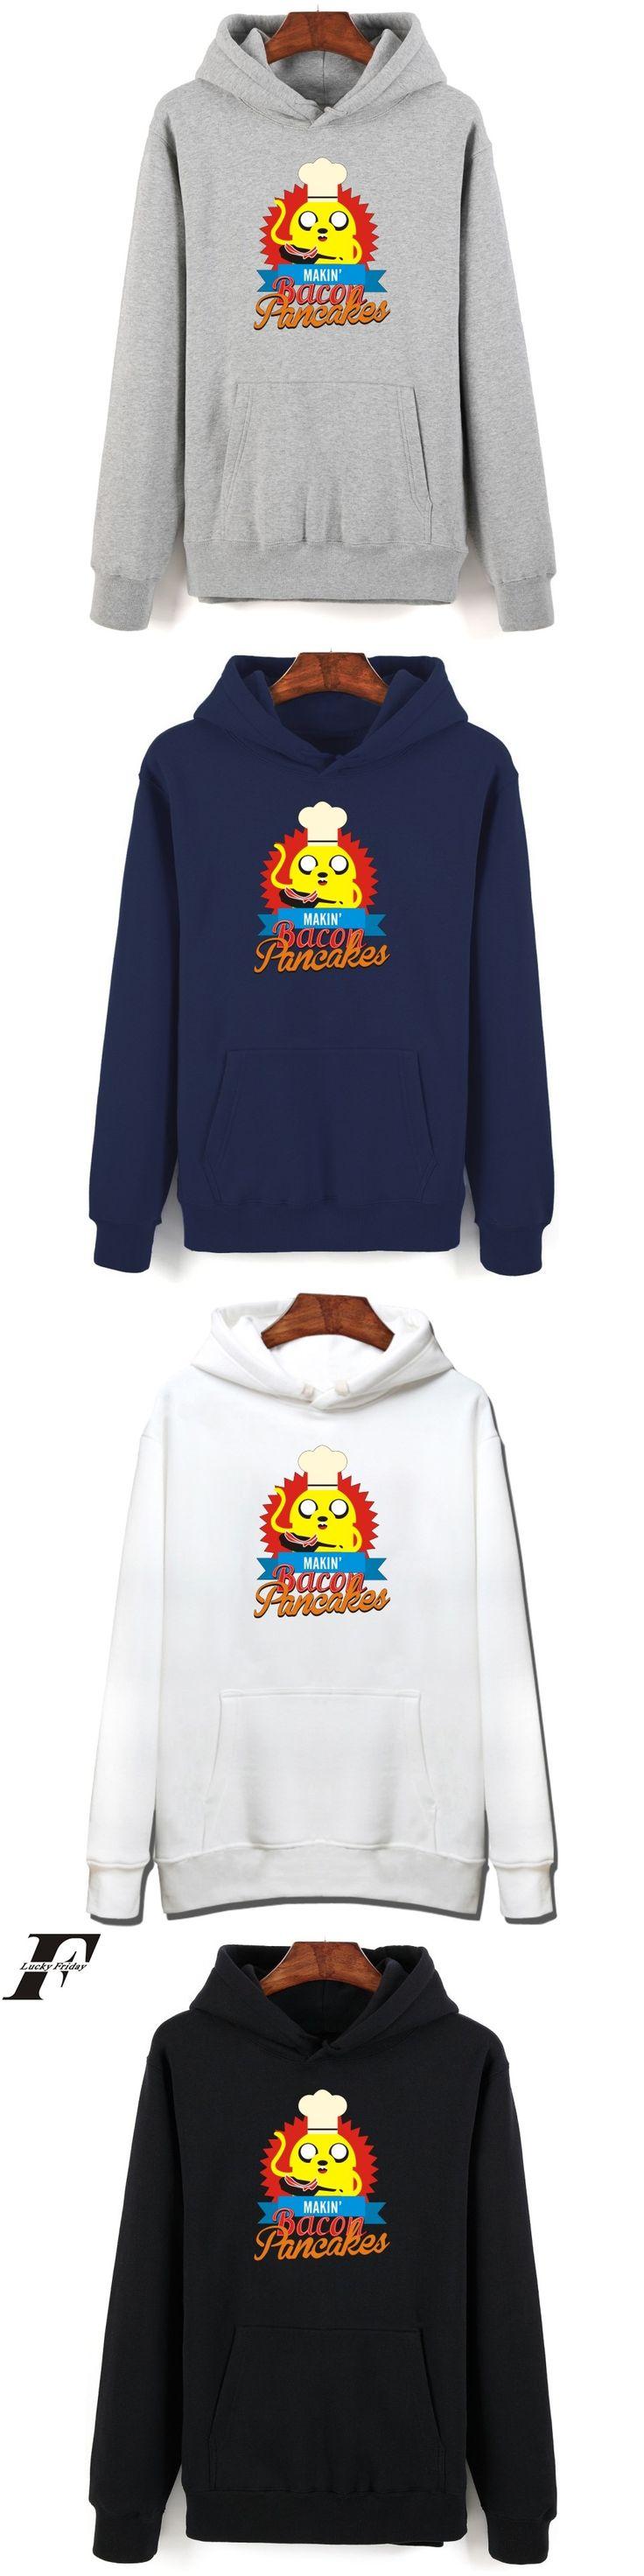 LUCKYFRIDAYF women/ men adventure time hoodies adventure time hoodies and sweatshirt adventure time hoodies for men hoodies